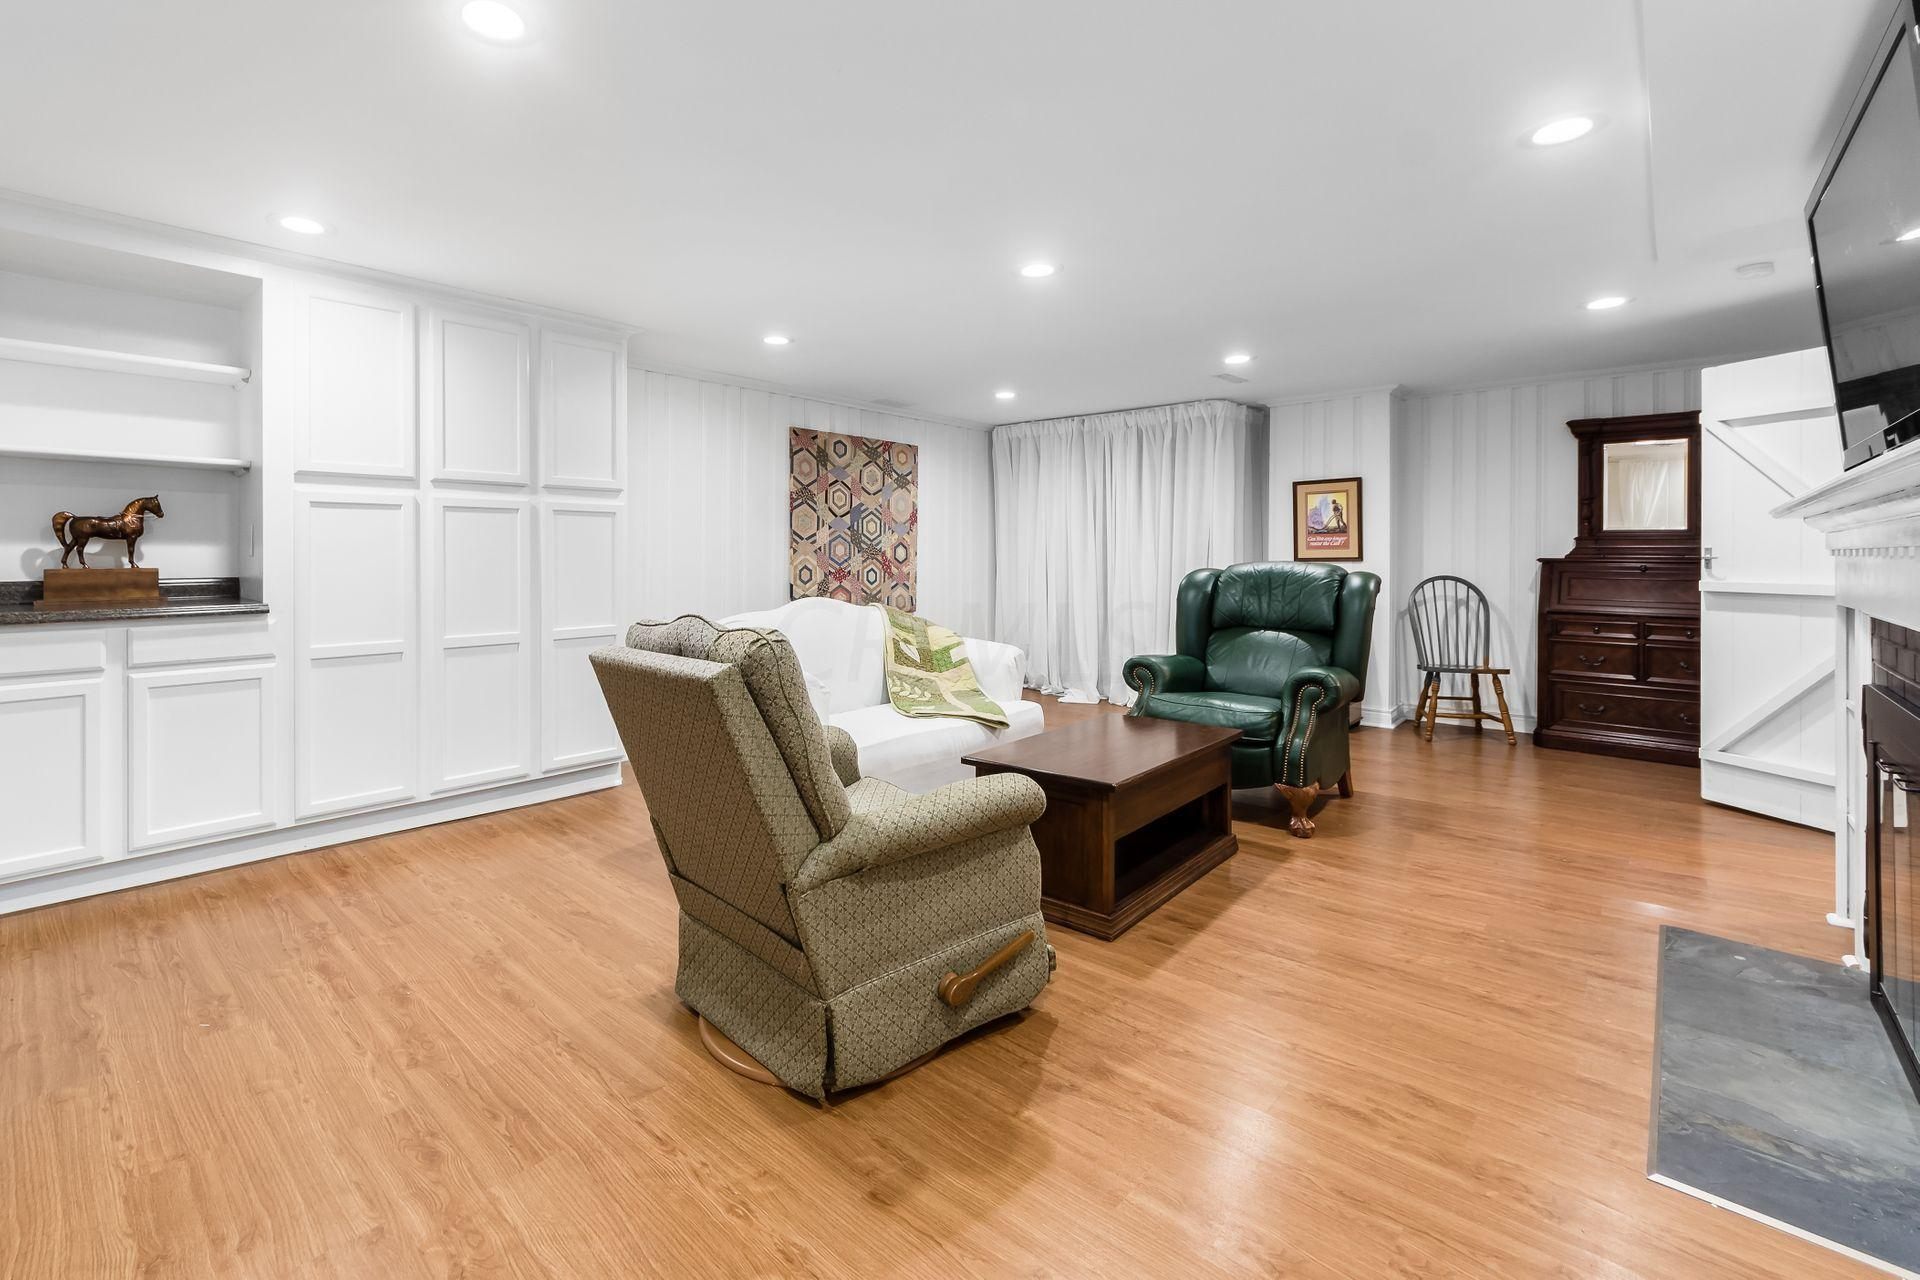 5809 Olentangy Boulevard, Worthington, Ohio 43085, 3 Bedrooms Bedrooms, ,2 BathroomsBathrooms,Residential,For Sale,Olentangy,221000946